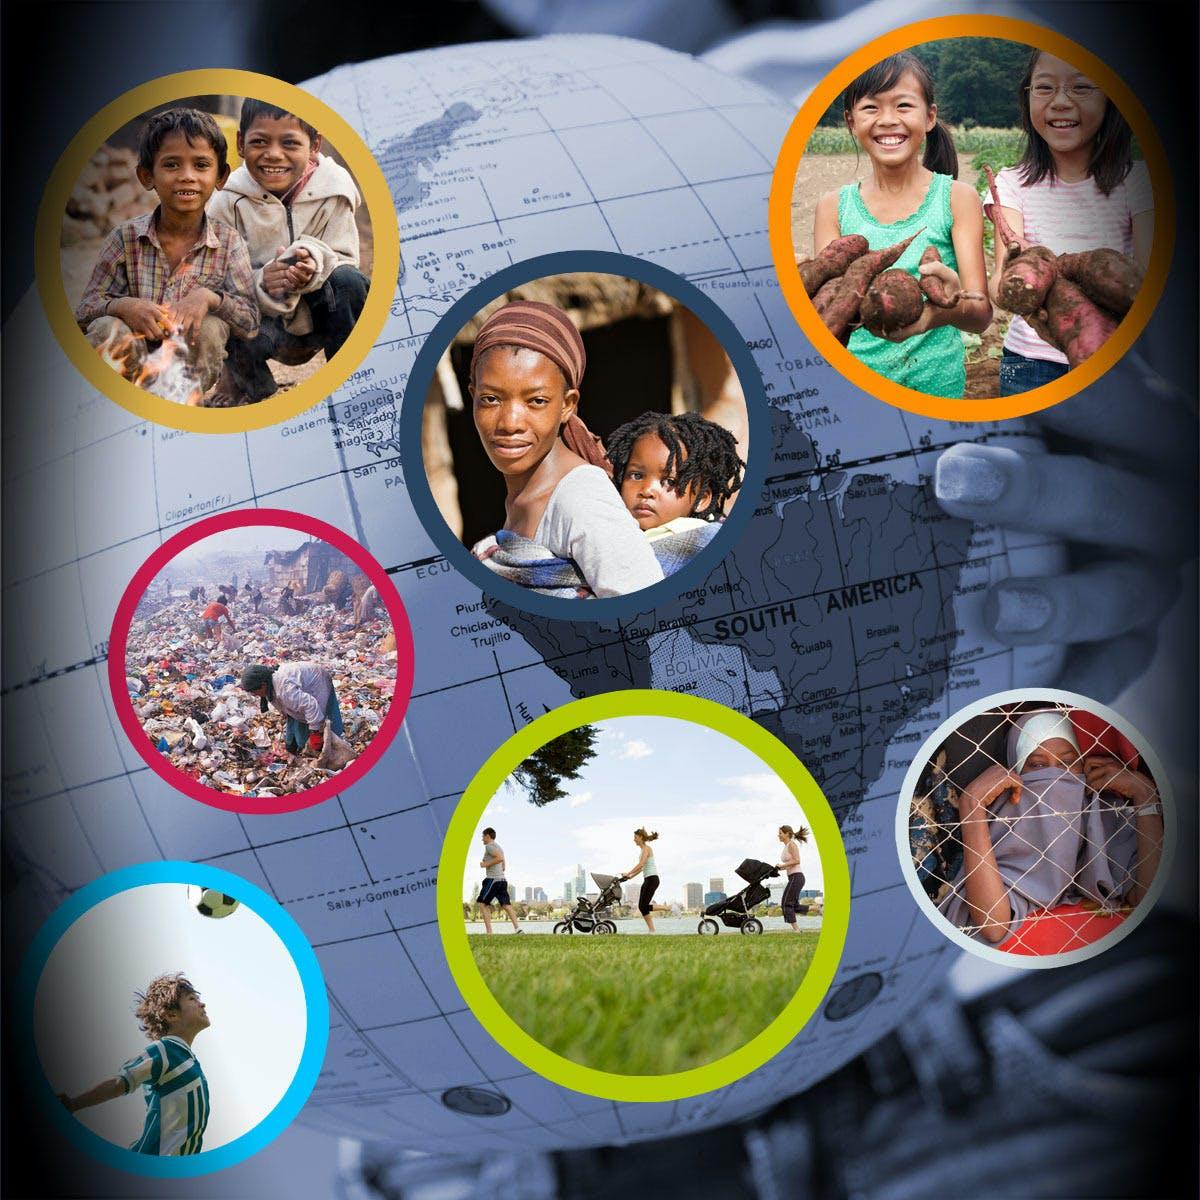 Global Health: An Interdisciplinary Overview